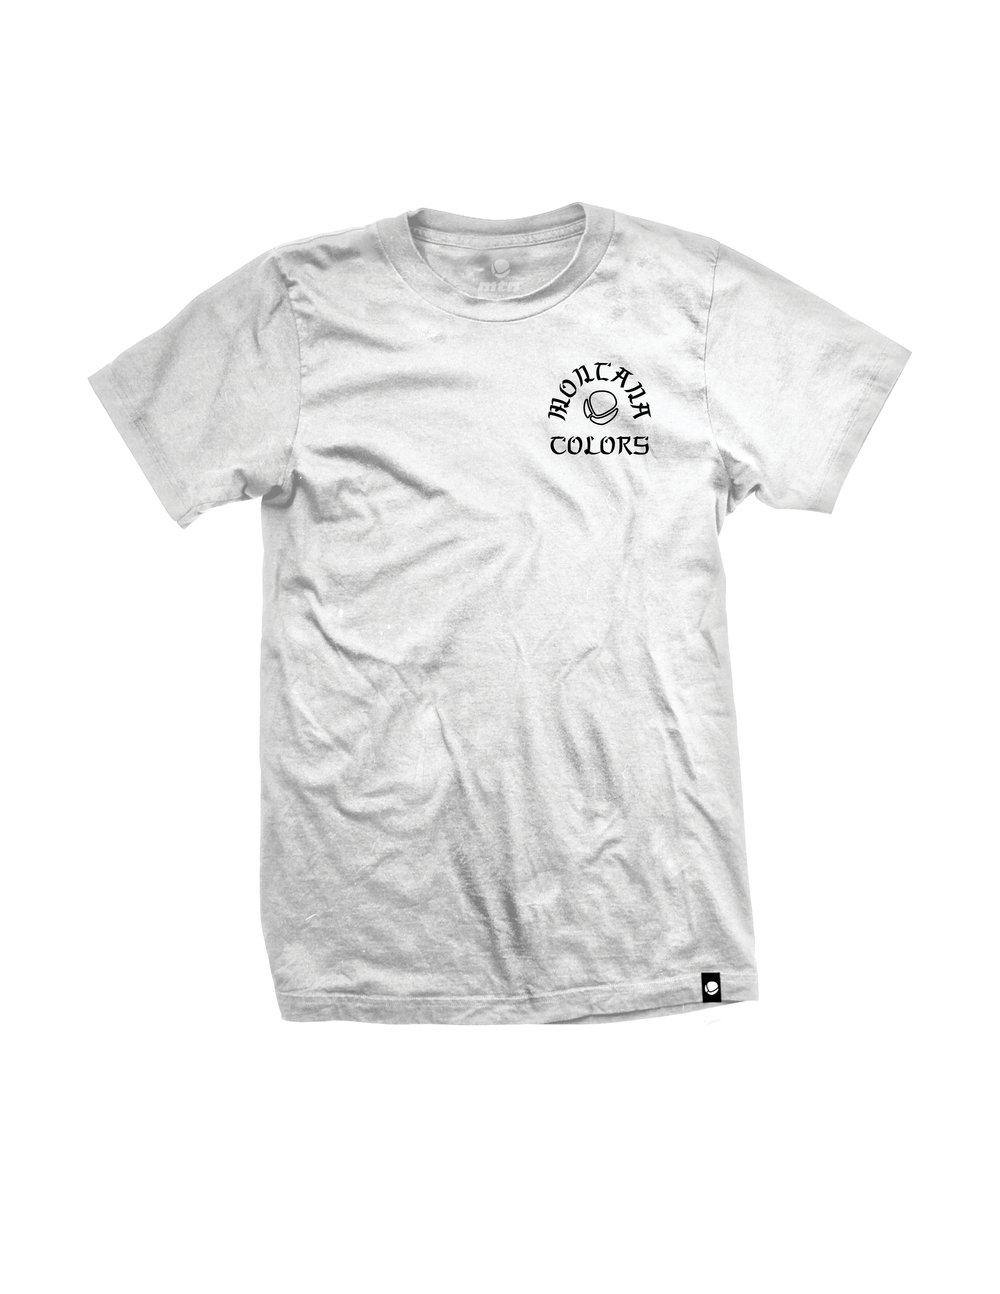 MikeGonsalves-MontanaTshirtMocks67.jpg